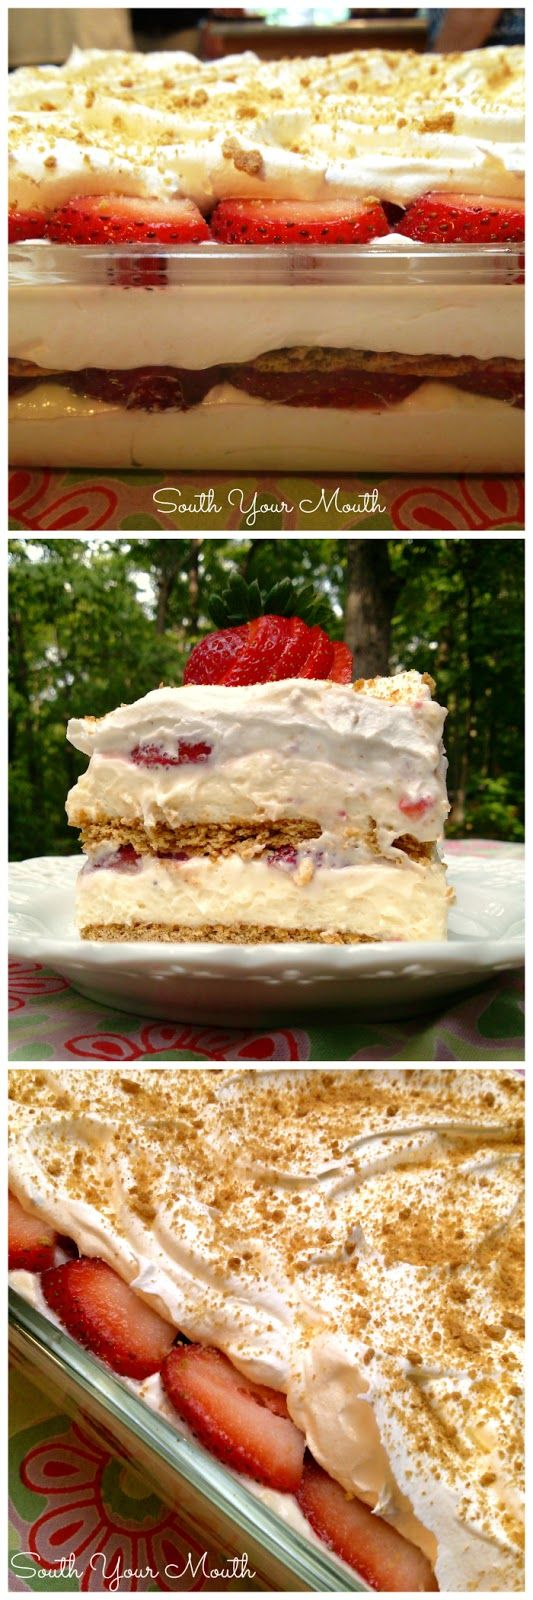 Strawberry Cream Cheese Icebox Cake! An easy no-bake layered dessert with graham crackers, cheesecake filling and fresh strawberries.